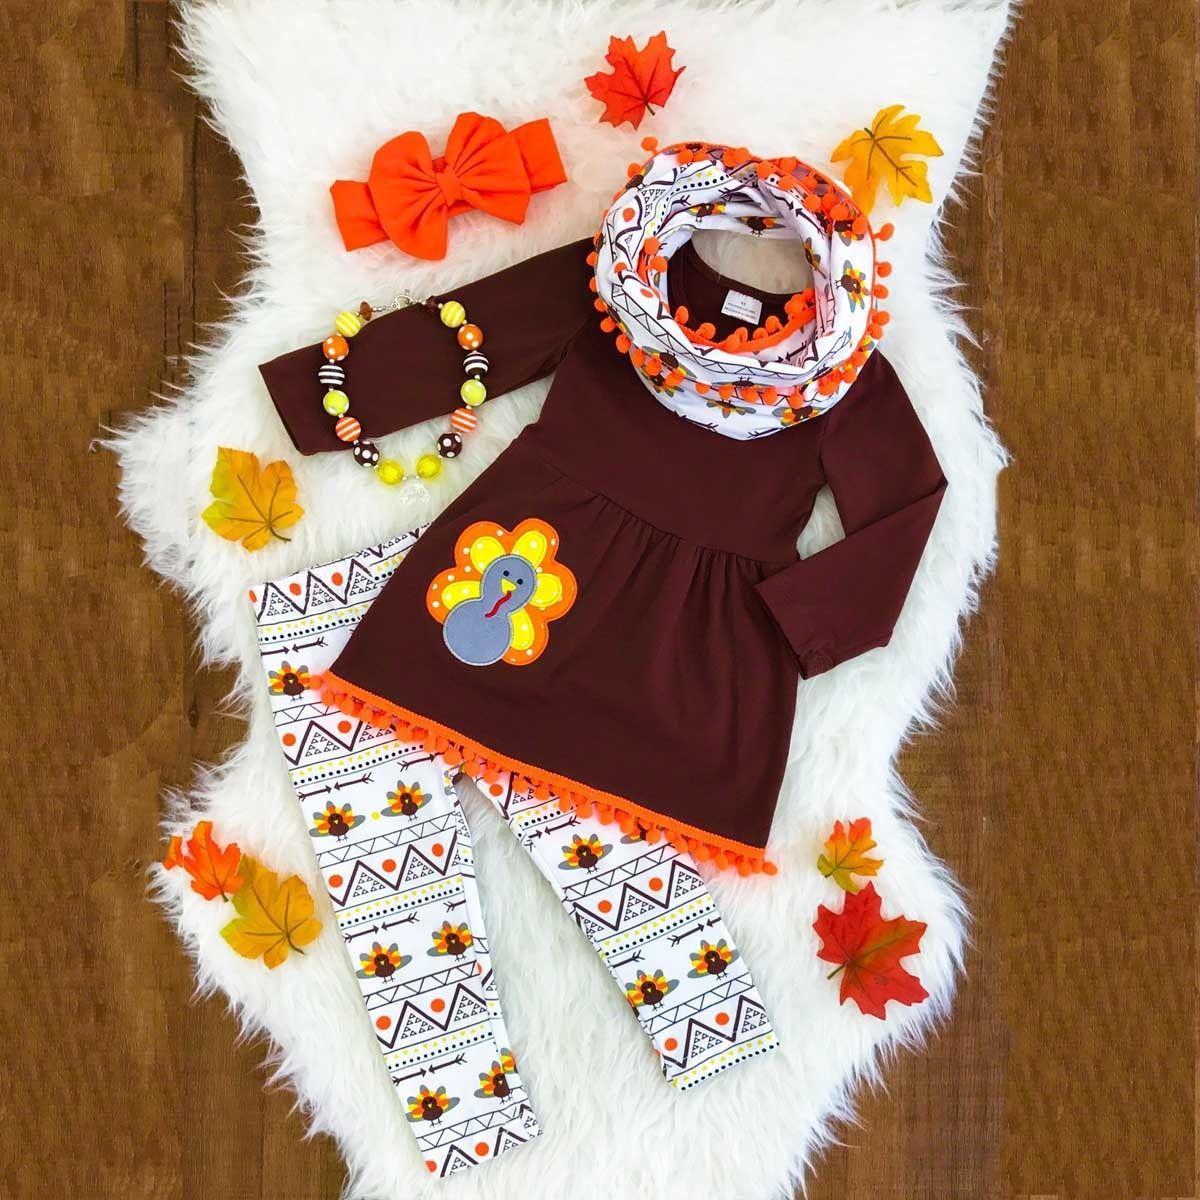 Jour de Thanksgiving Kids Baby GirlsClothes T-shirt Tops Robe + Long Pantalon Toddler Outfit Filles Fall Boutique Ensemble de vêtements